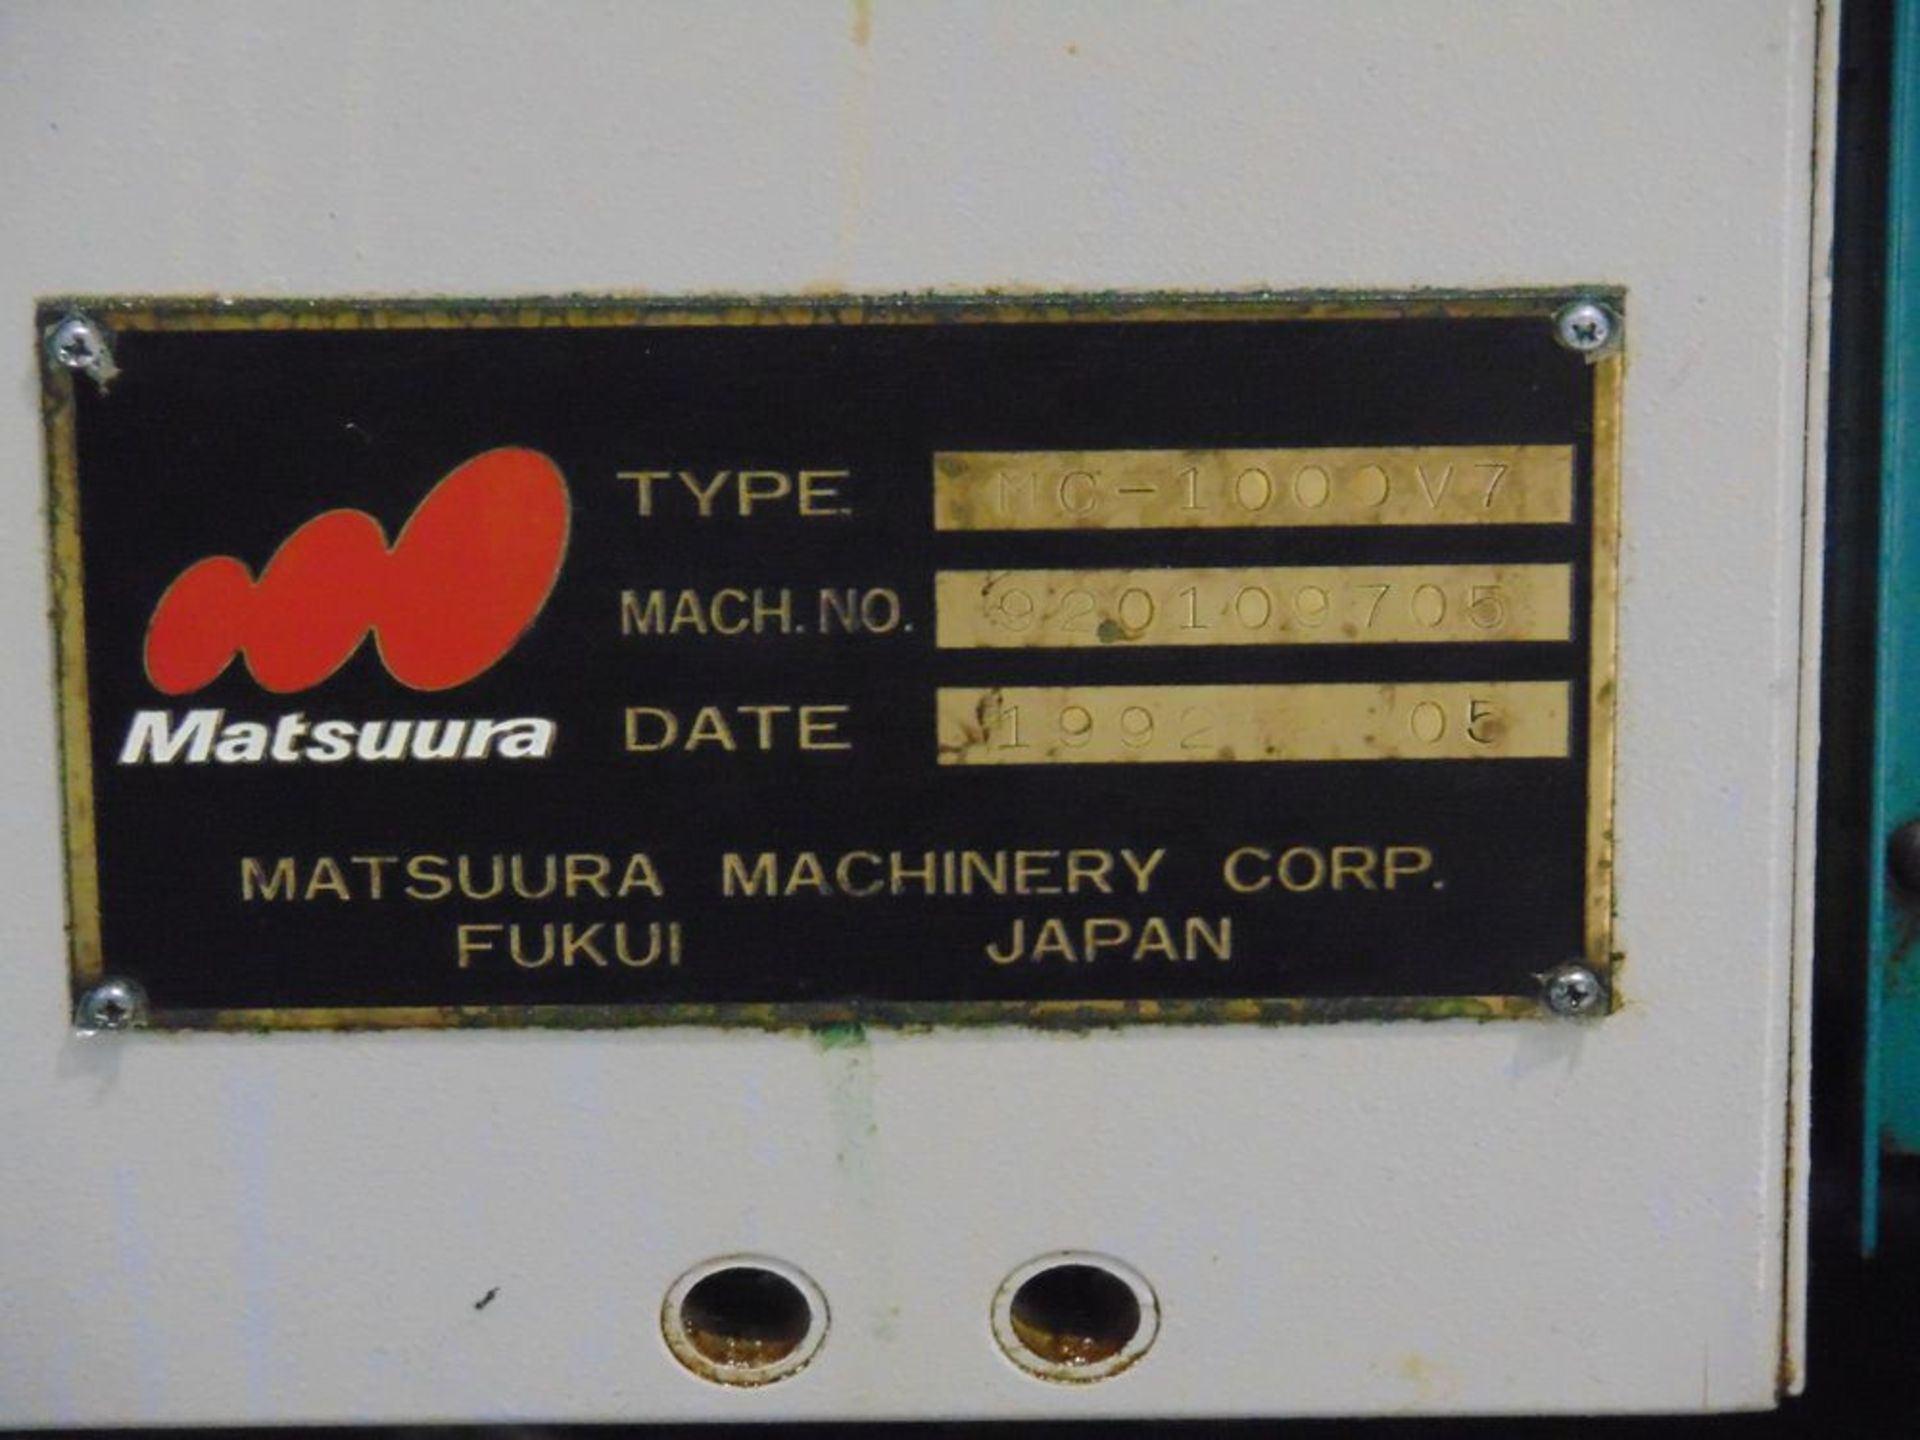 Lot 26 - (1992) Matsuura mod. MC1000V-DC 3-Axis CNC Vertical Machine Center, 3' x 4' Table, Thru Spindle